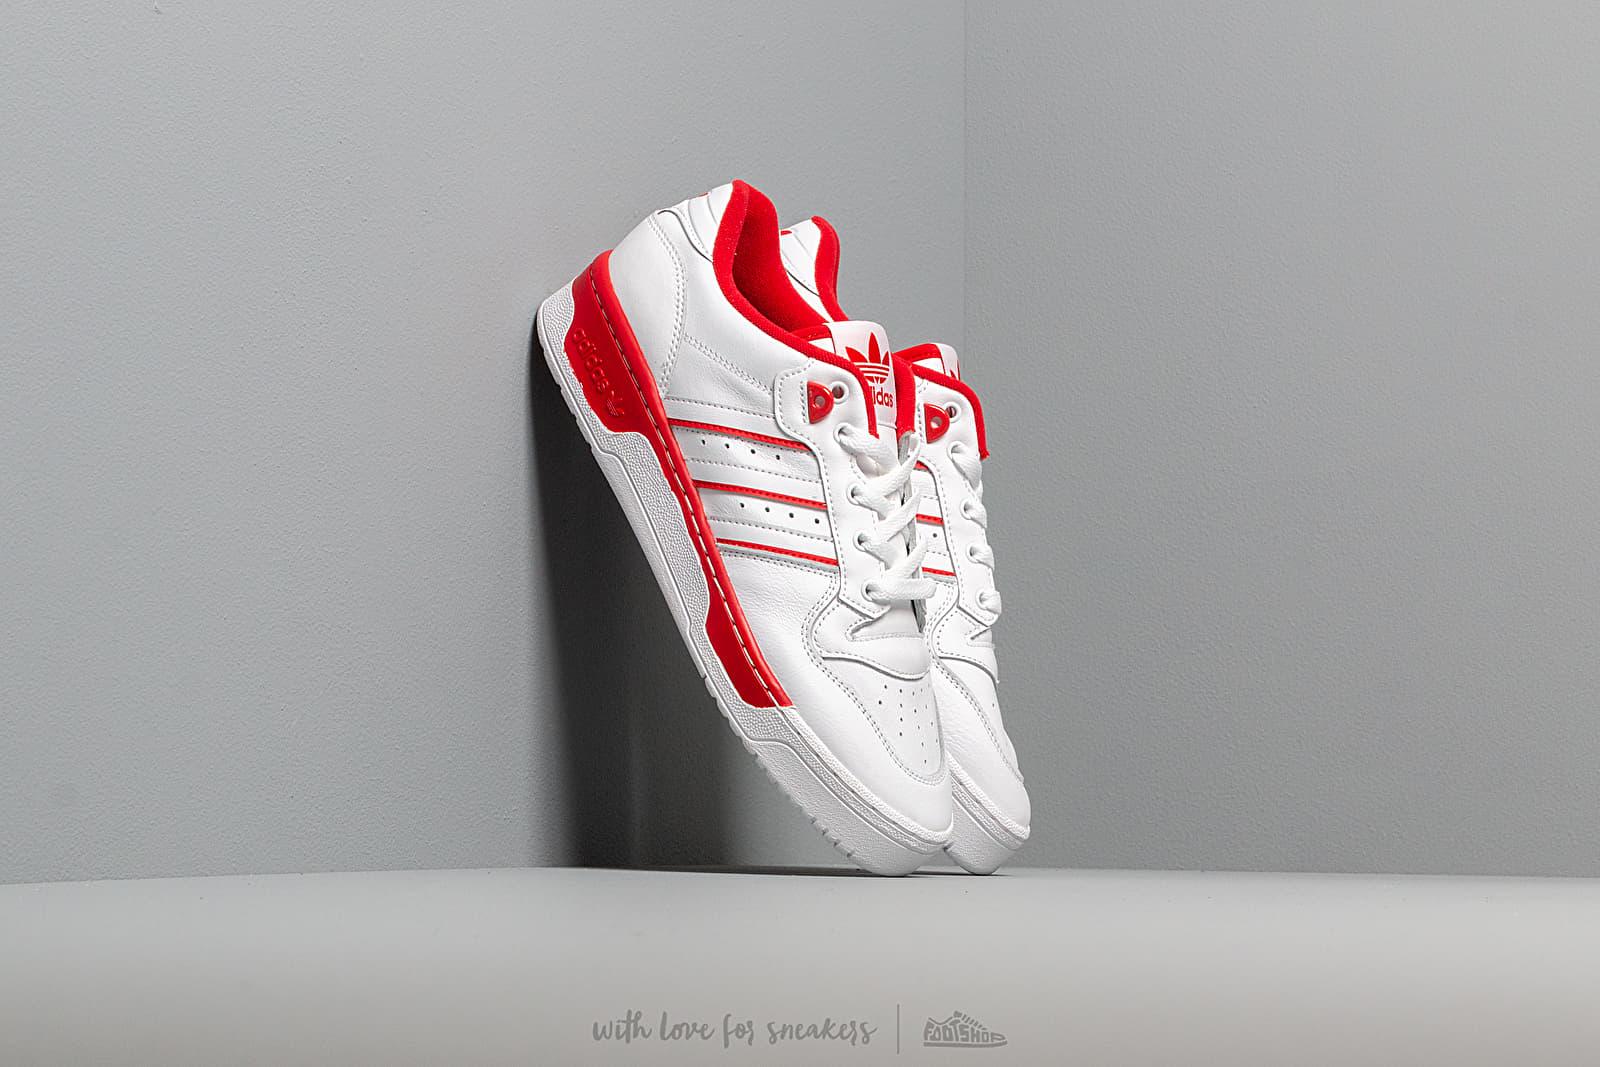 Pánské tenisky a boty adidas Rivalry Low Ftw White/ Ftw White/ Scarlet